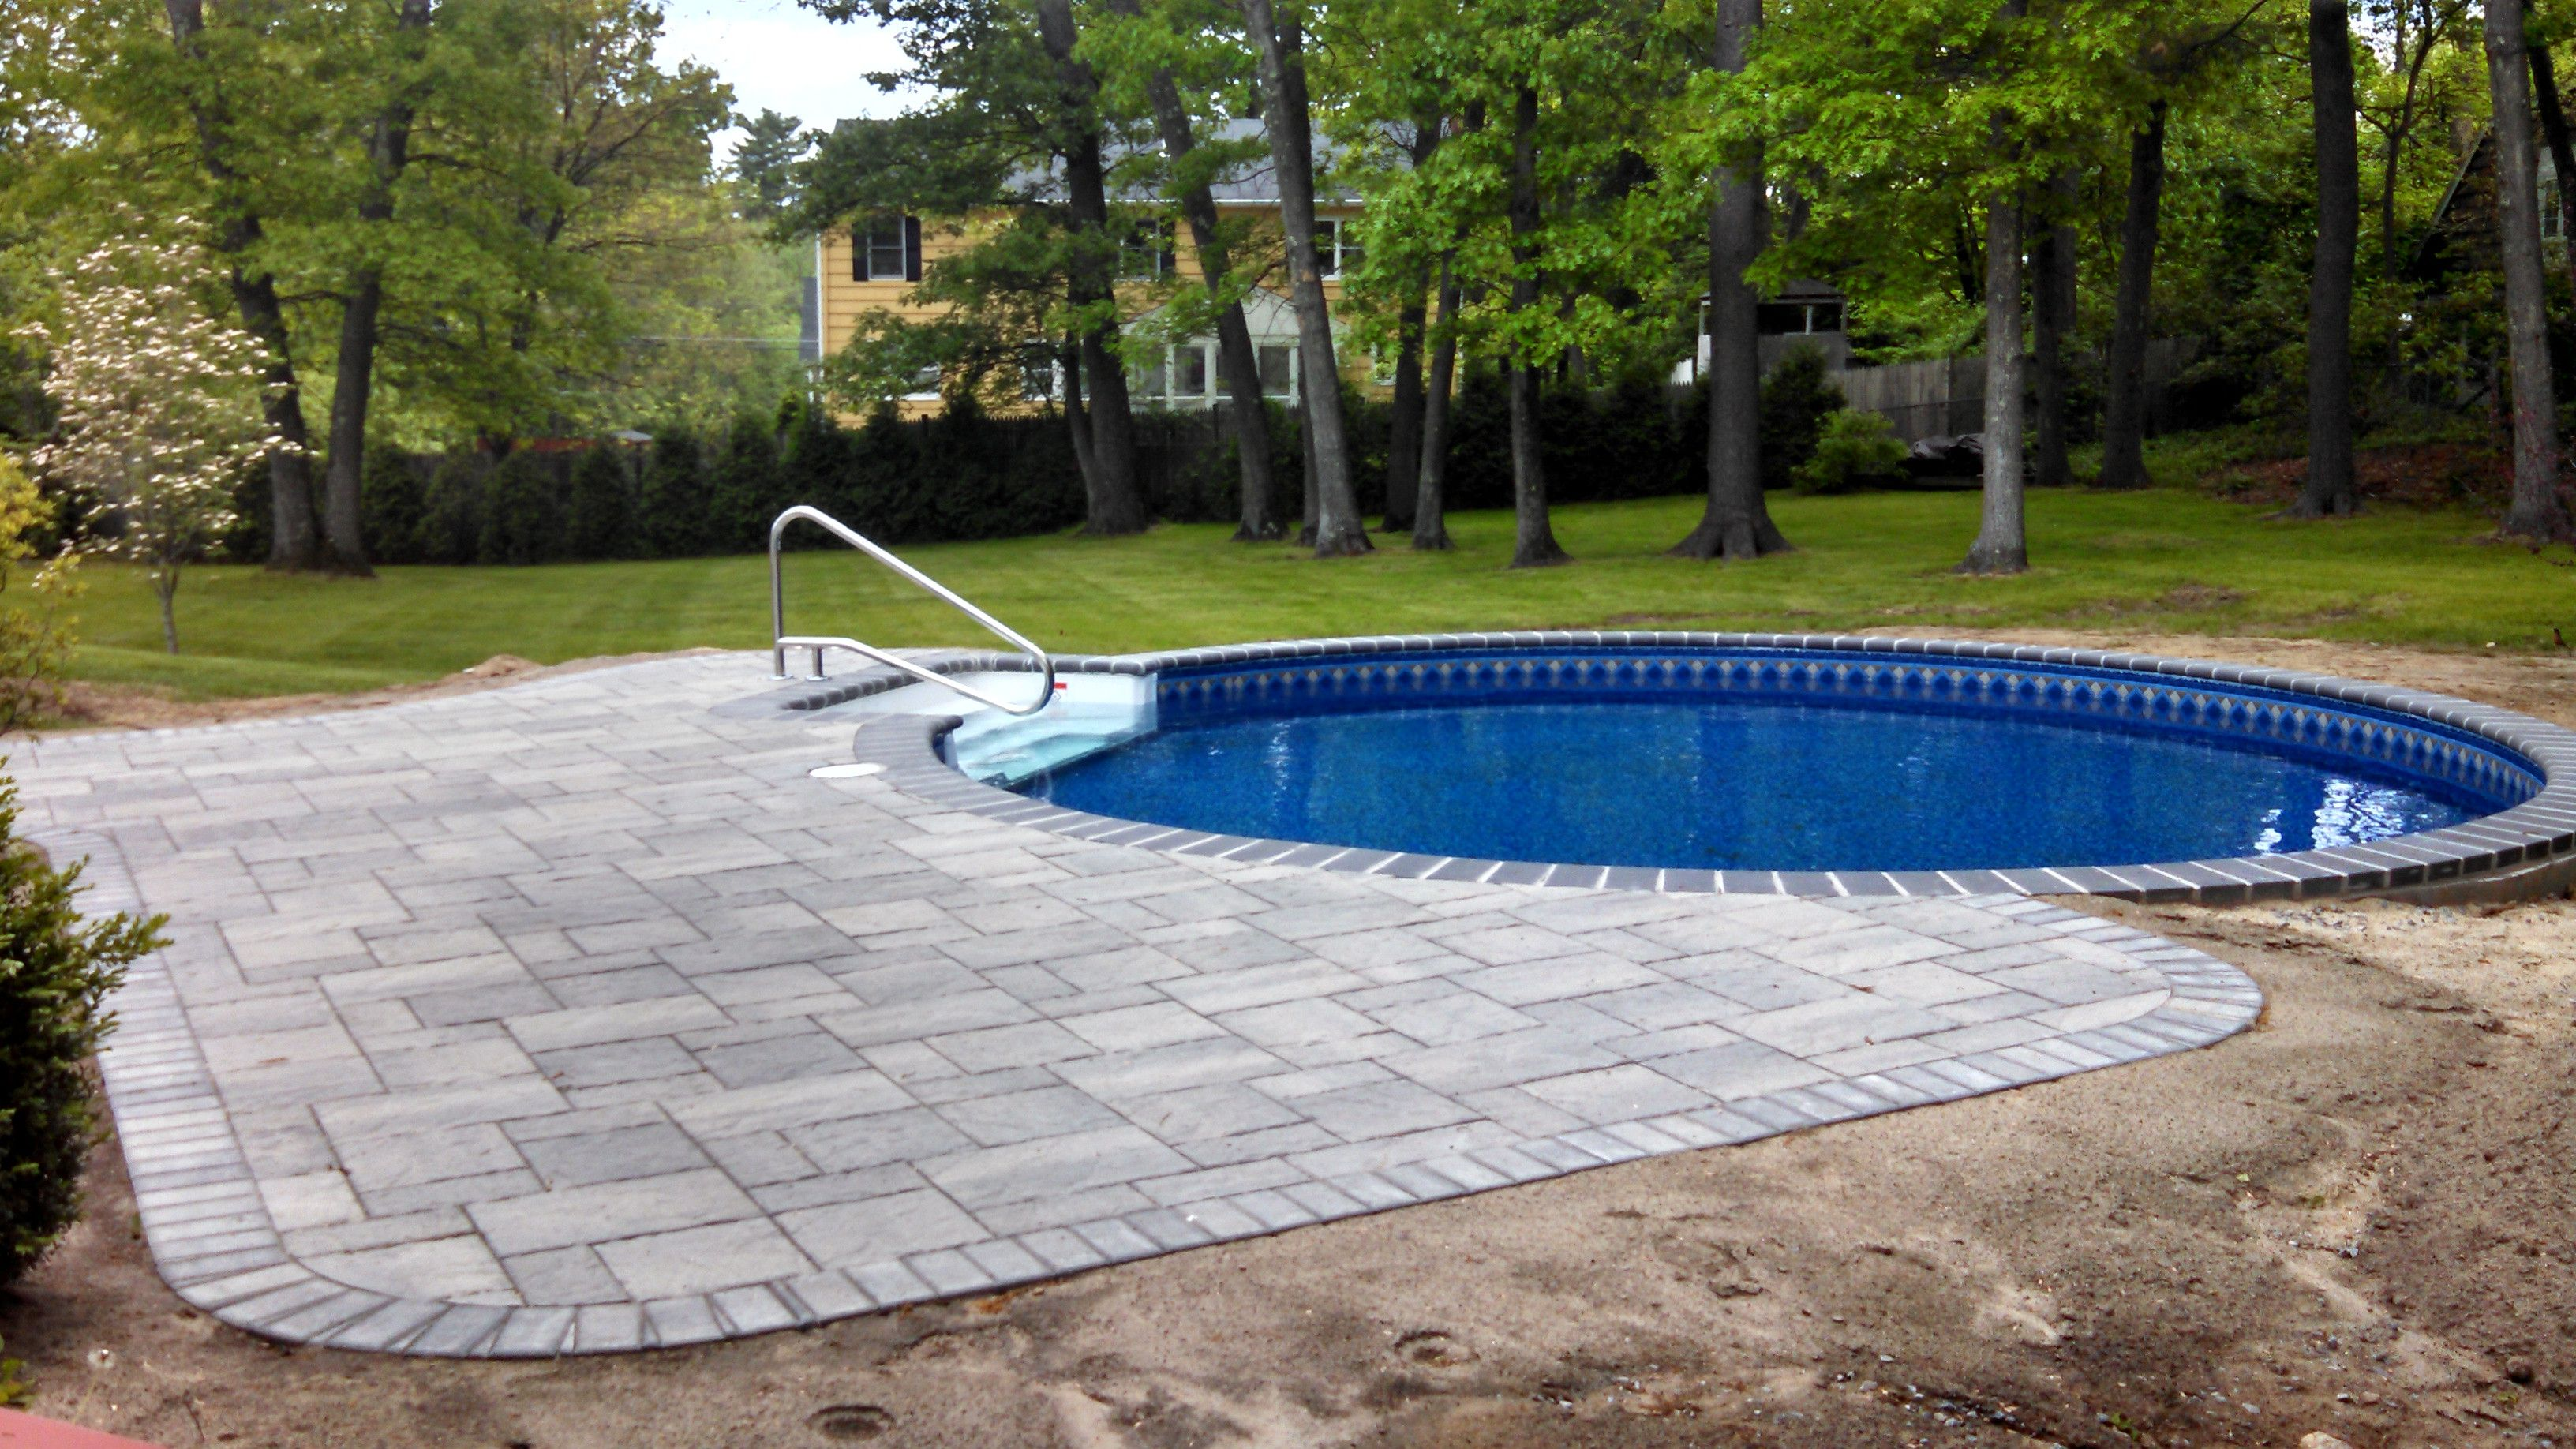 Chelmsford Ma Inground Swimming Pool Matley Swimming Pools And Spas Radiant Pools Backyard Pool Landscaping Backyard Pool